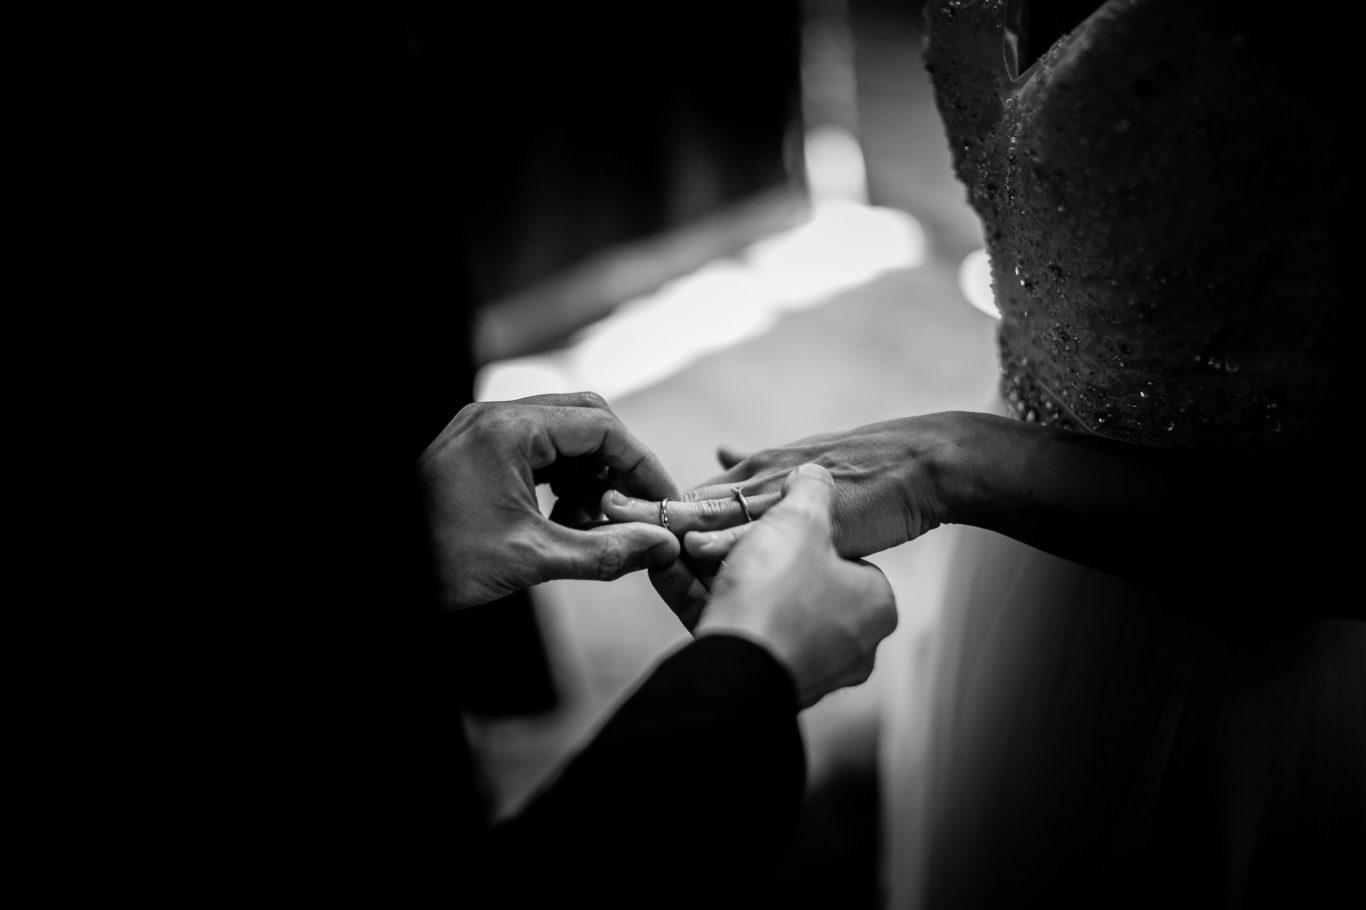 0251-fotografie-nunta-conacul-apafi-ana-simion-fotograf-ciprian-dumitrescu-dc1_0100